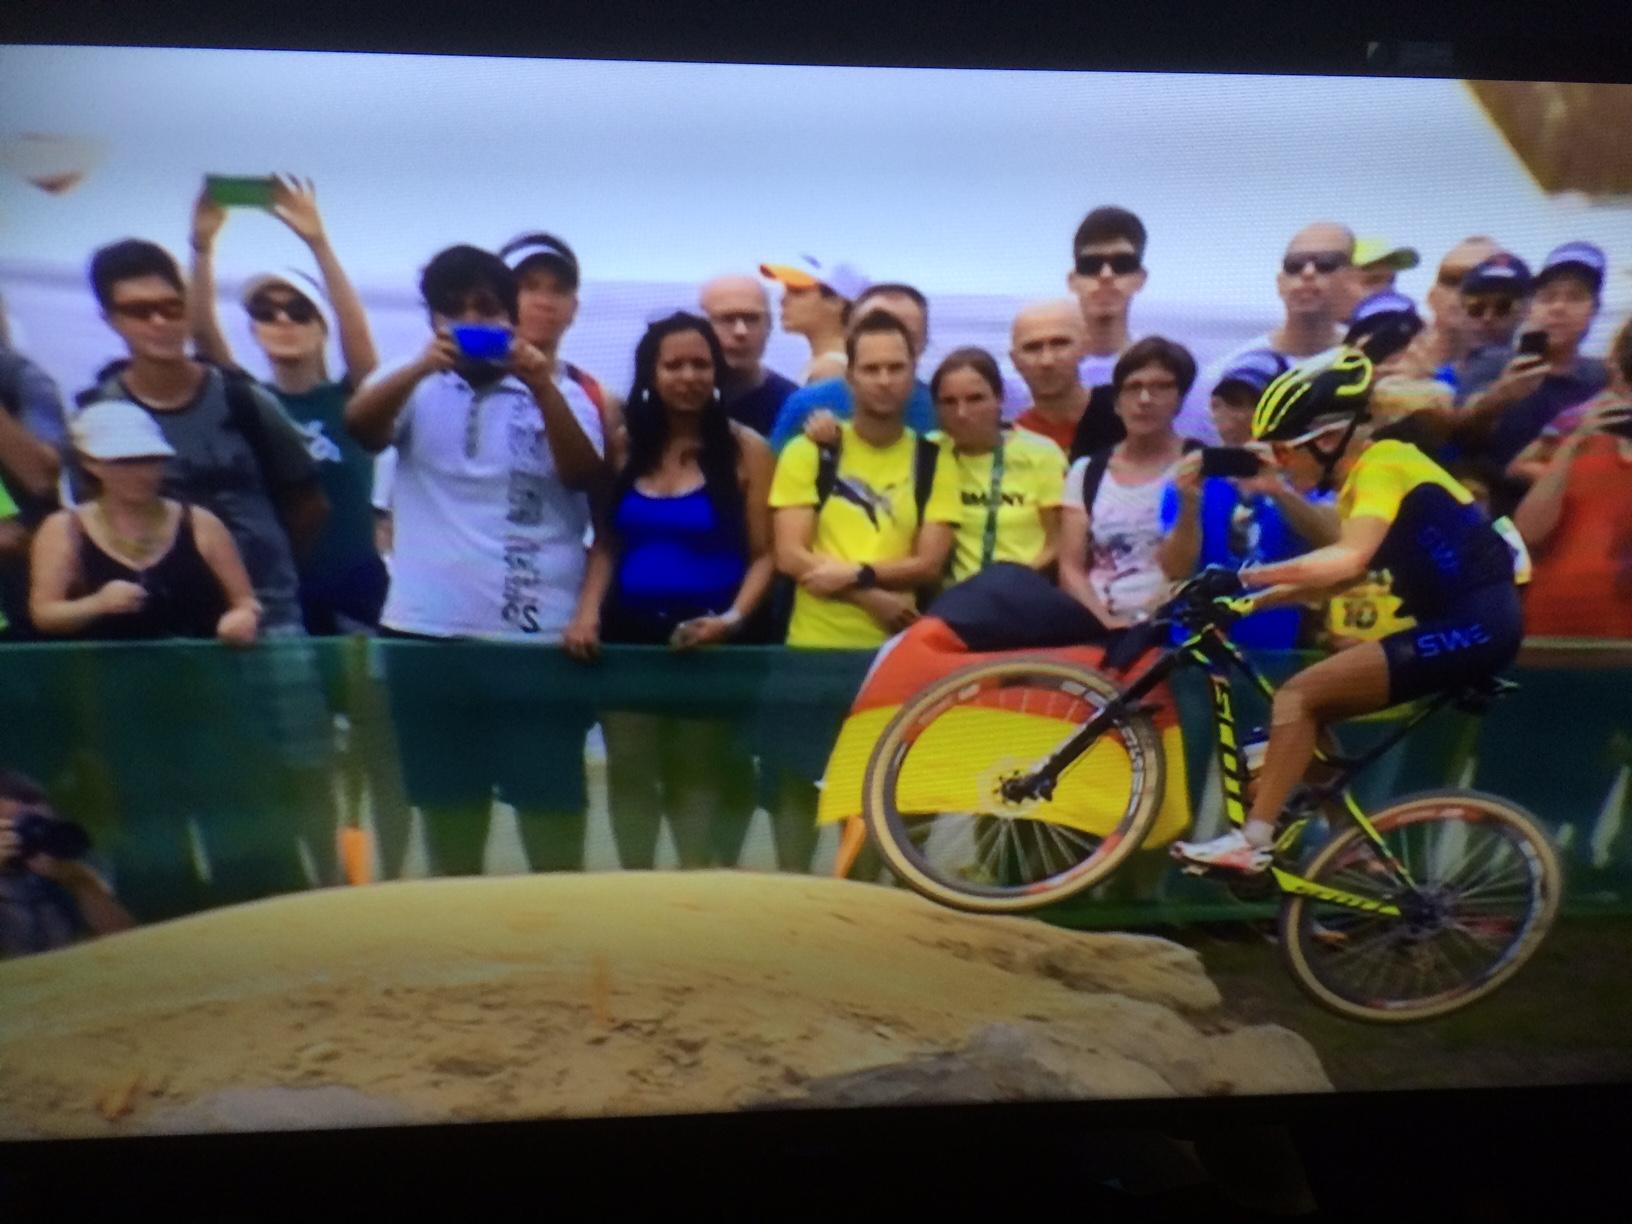 Offroadbiking – Jenny Rissveds olympisch kampioene, Githa ...